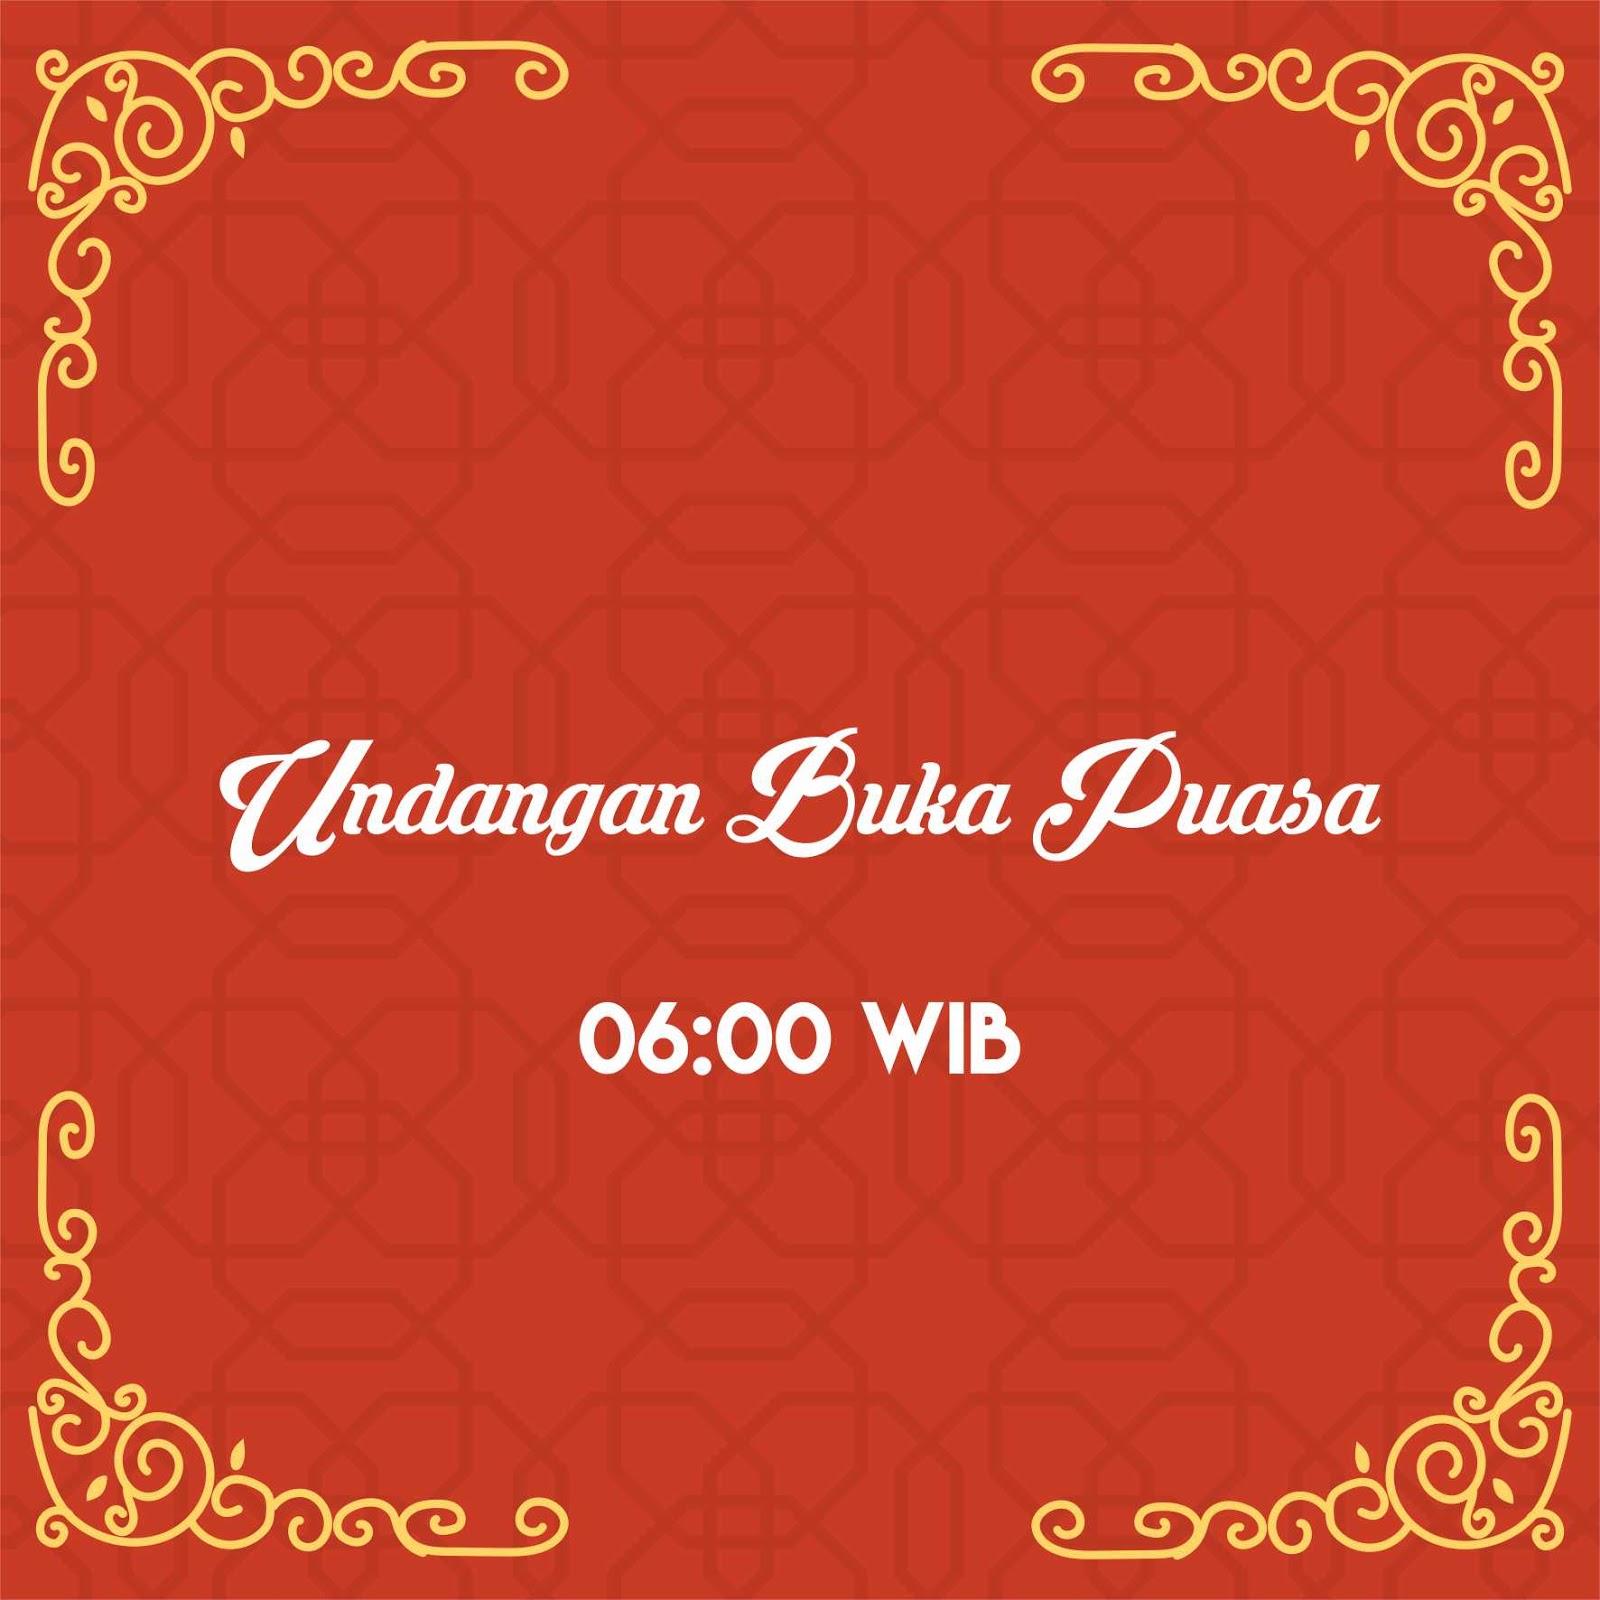 Undangan Buka Puasa Vector Logos And Design For Free Download